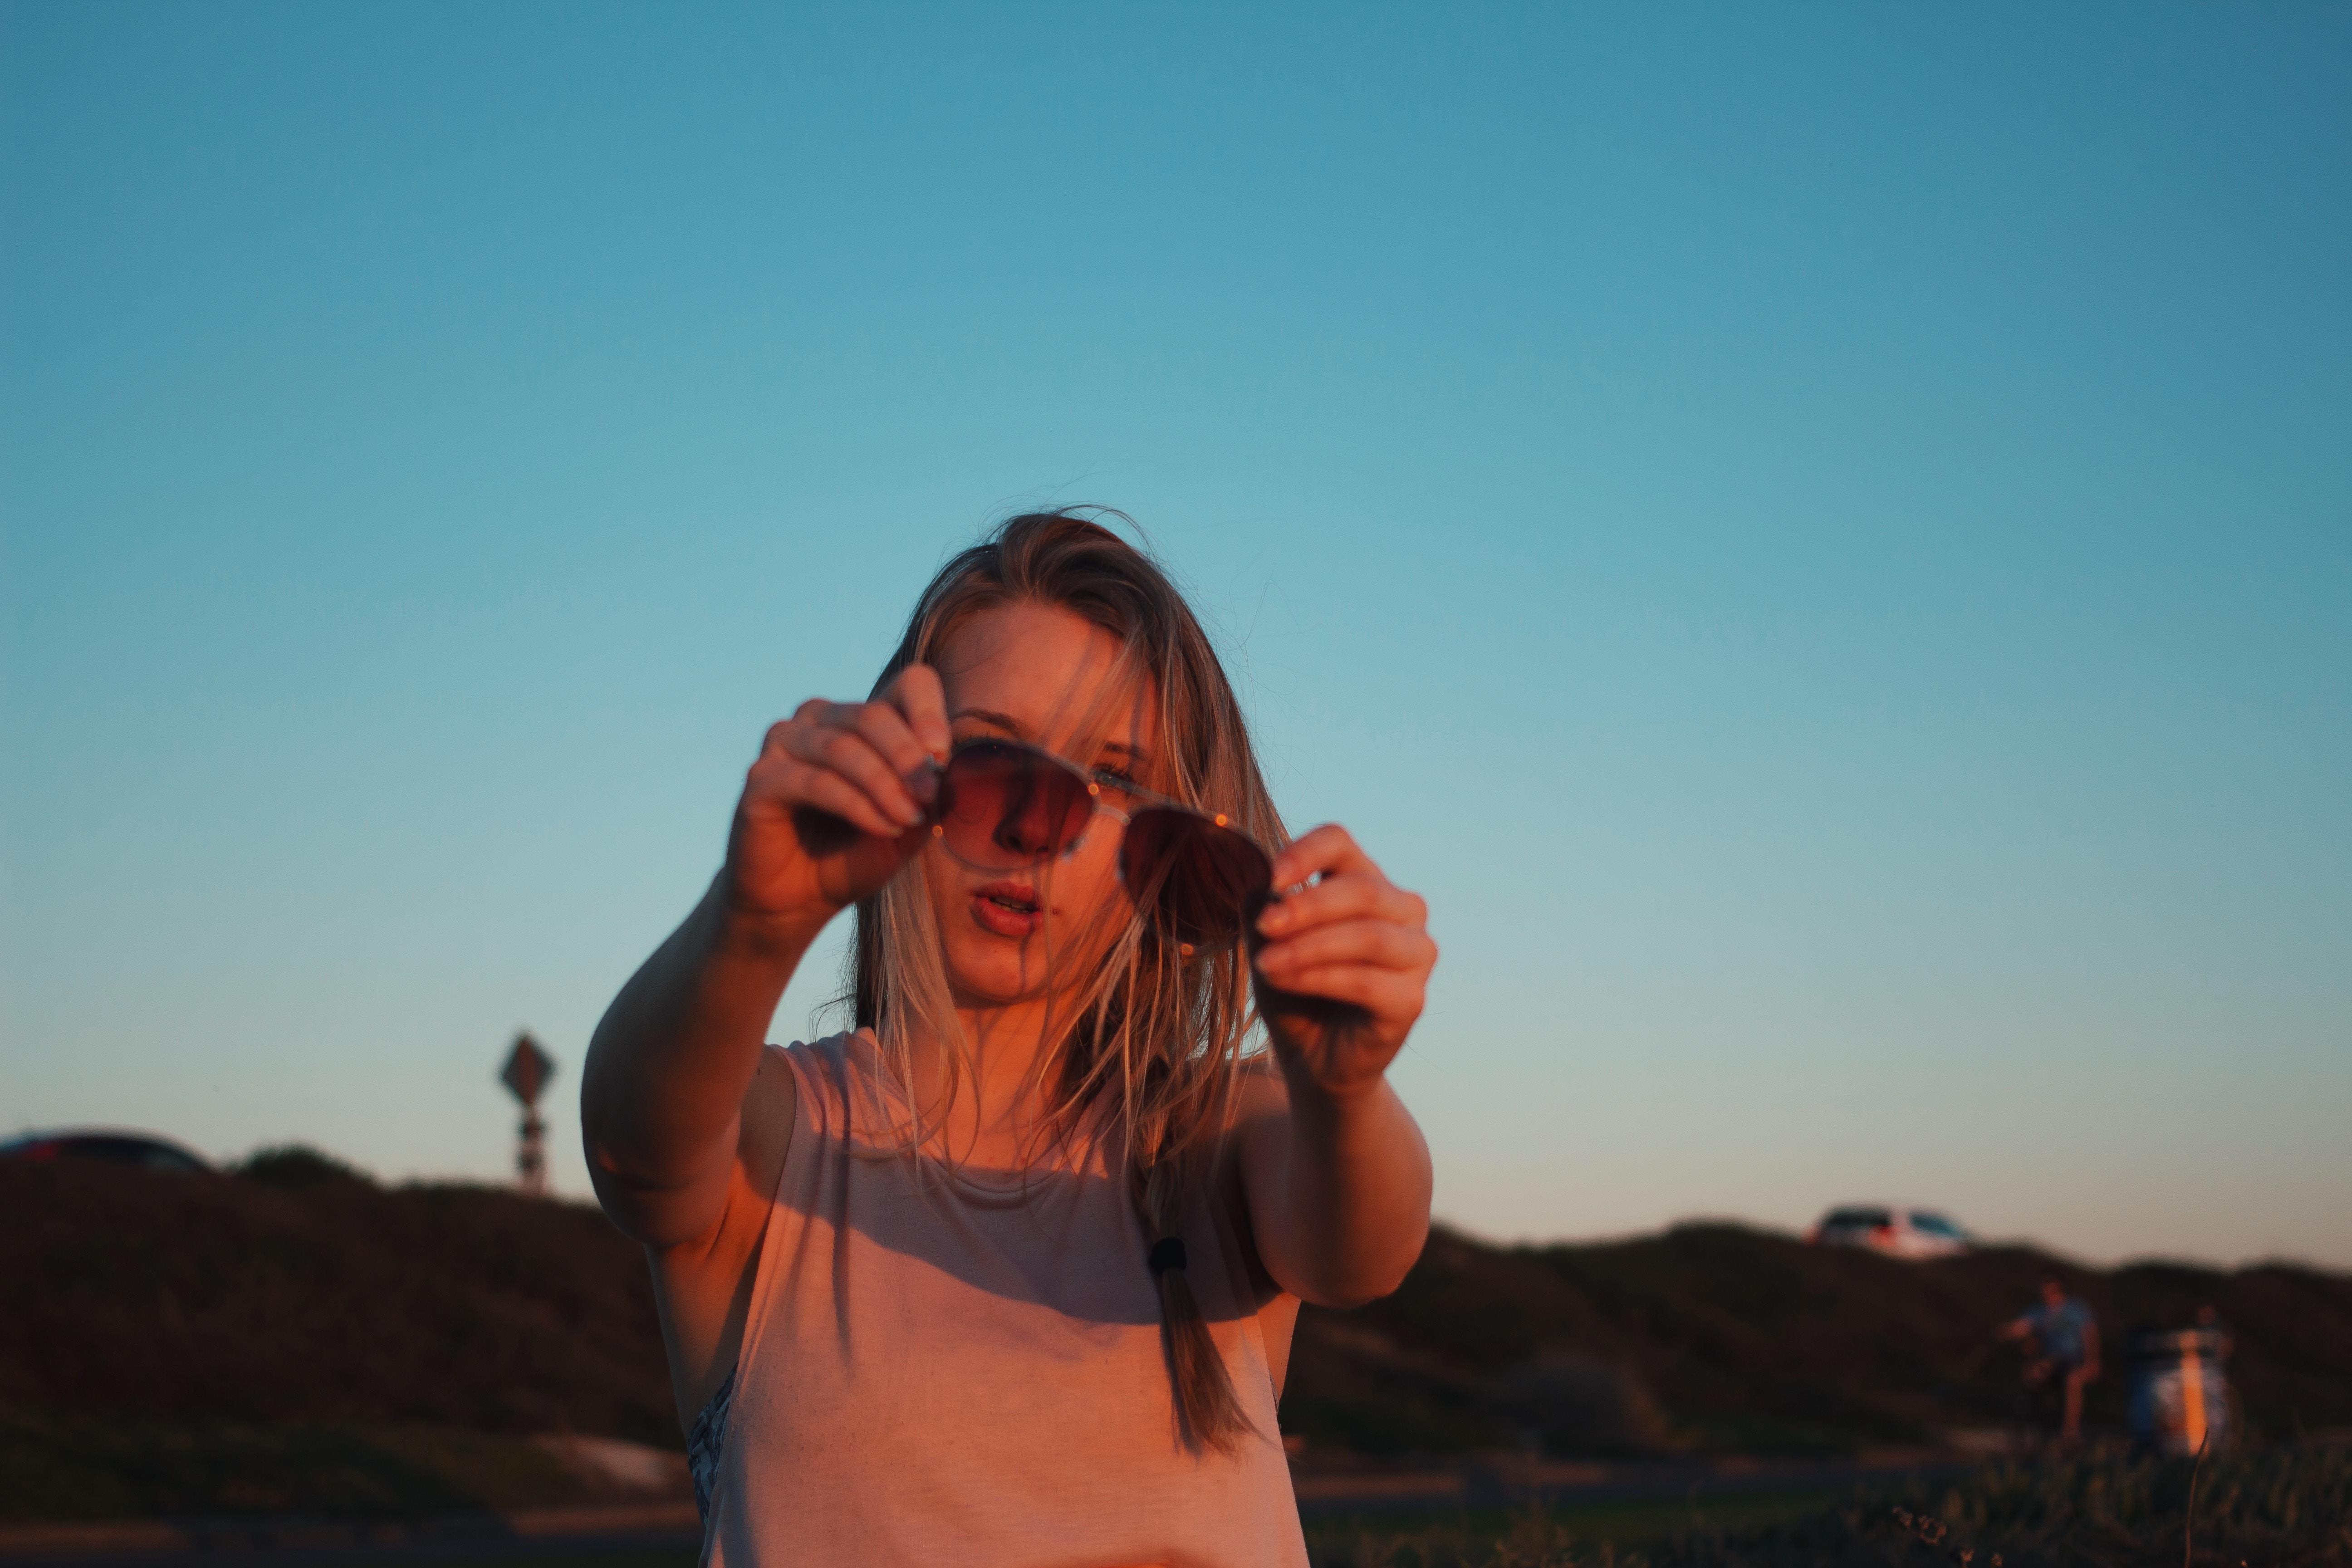 woman holding Aviator-style sunglasses